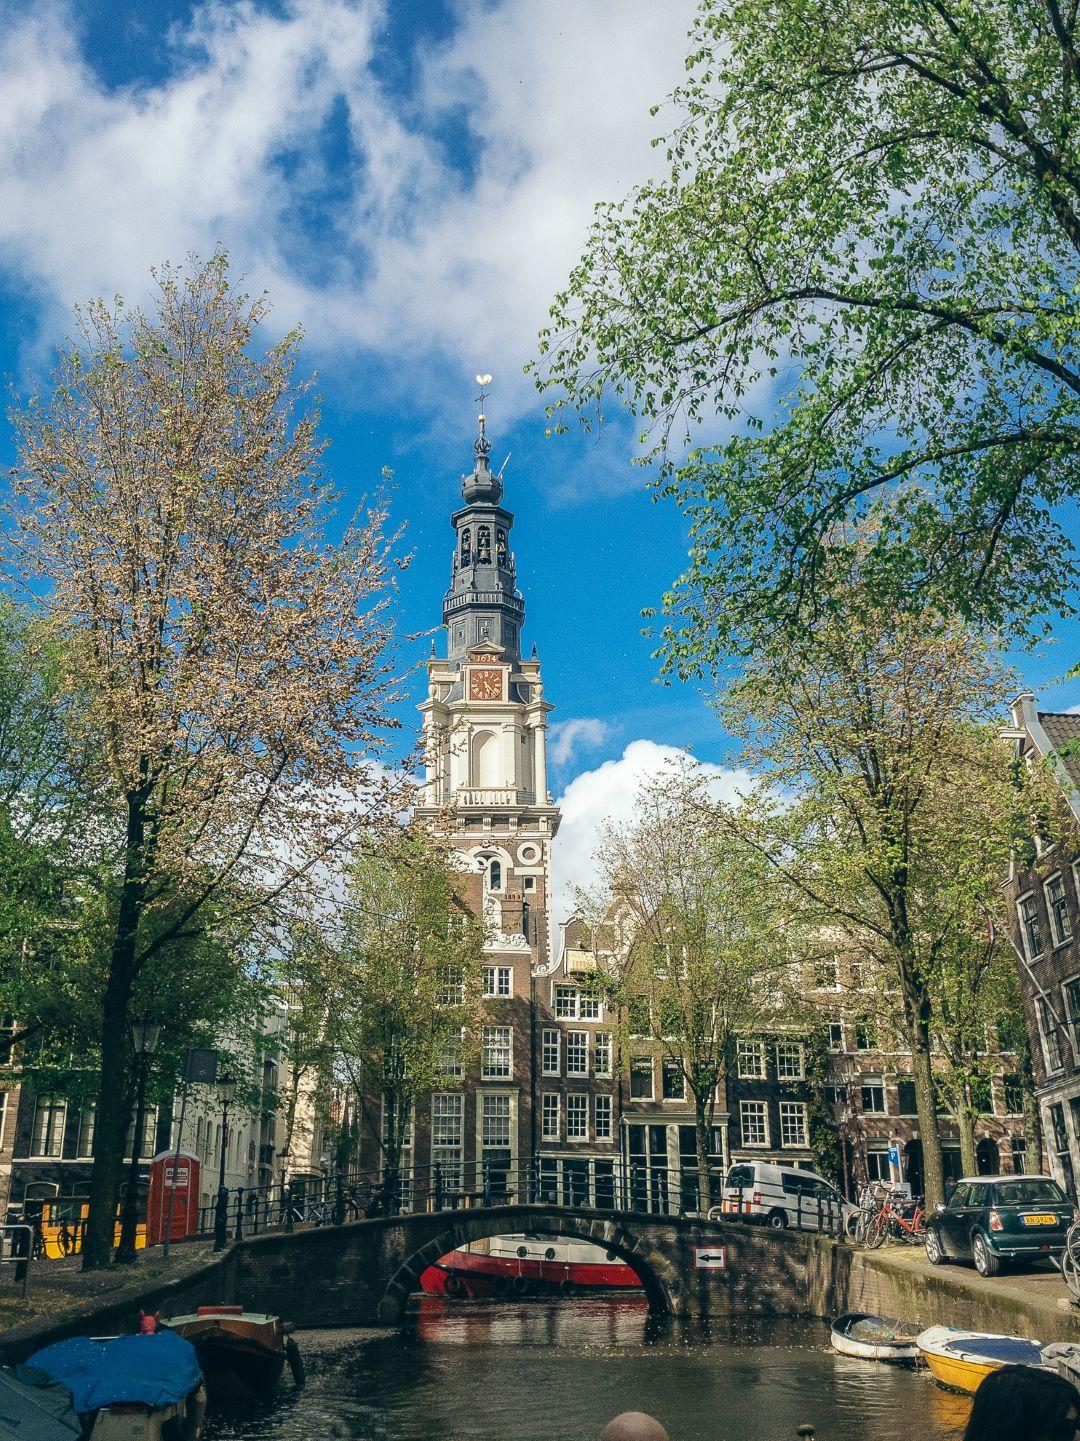 Amsterdam Church View from Boat.jpg